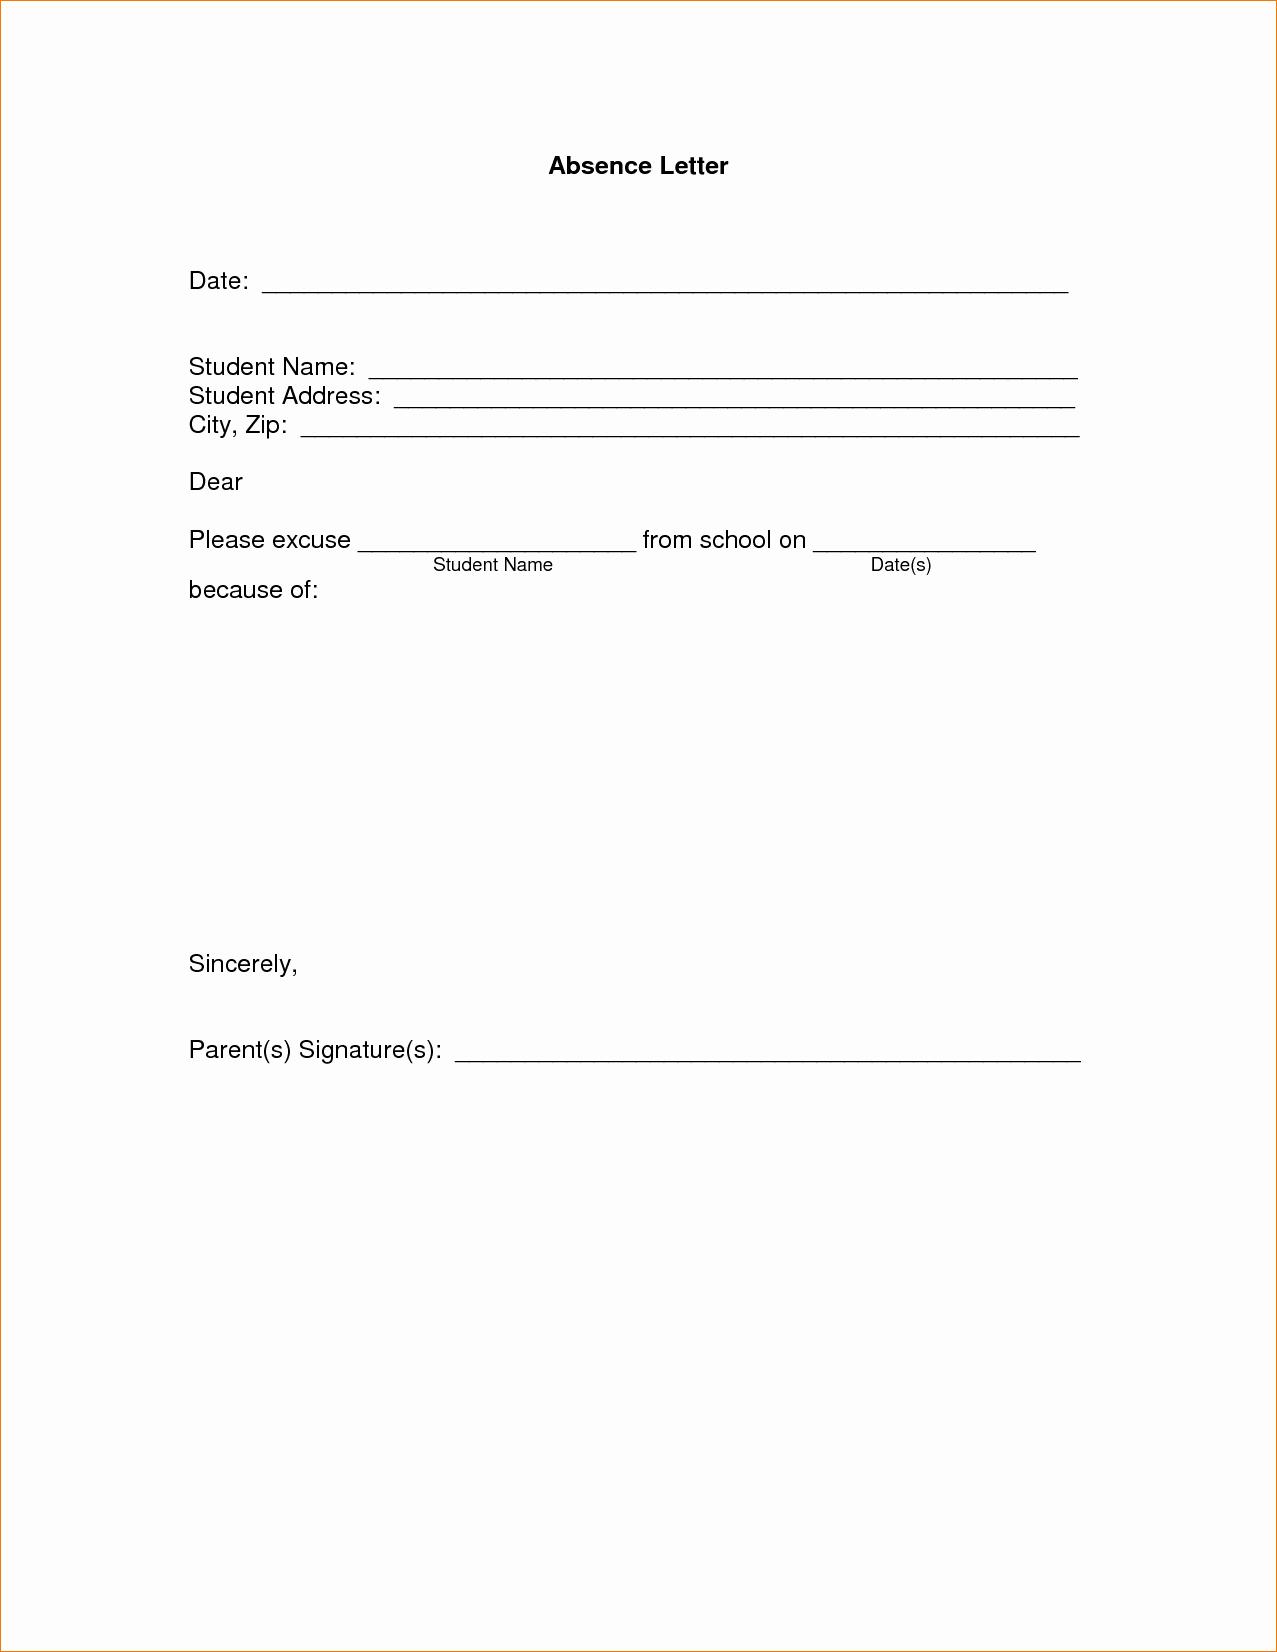 Absence Note Sample for School Elegant 11 Absence Excuse Letteragenda Template Sample